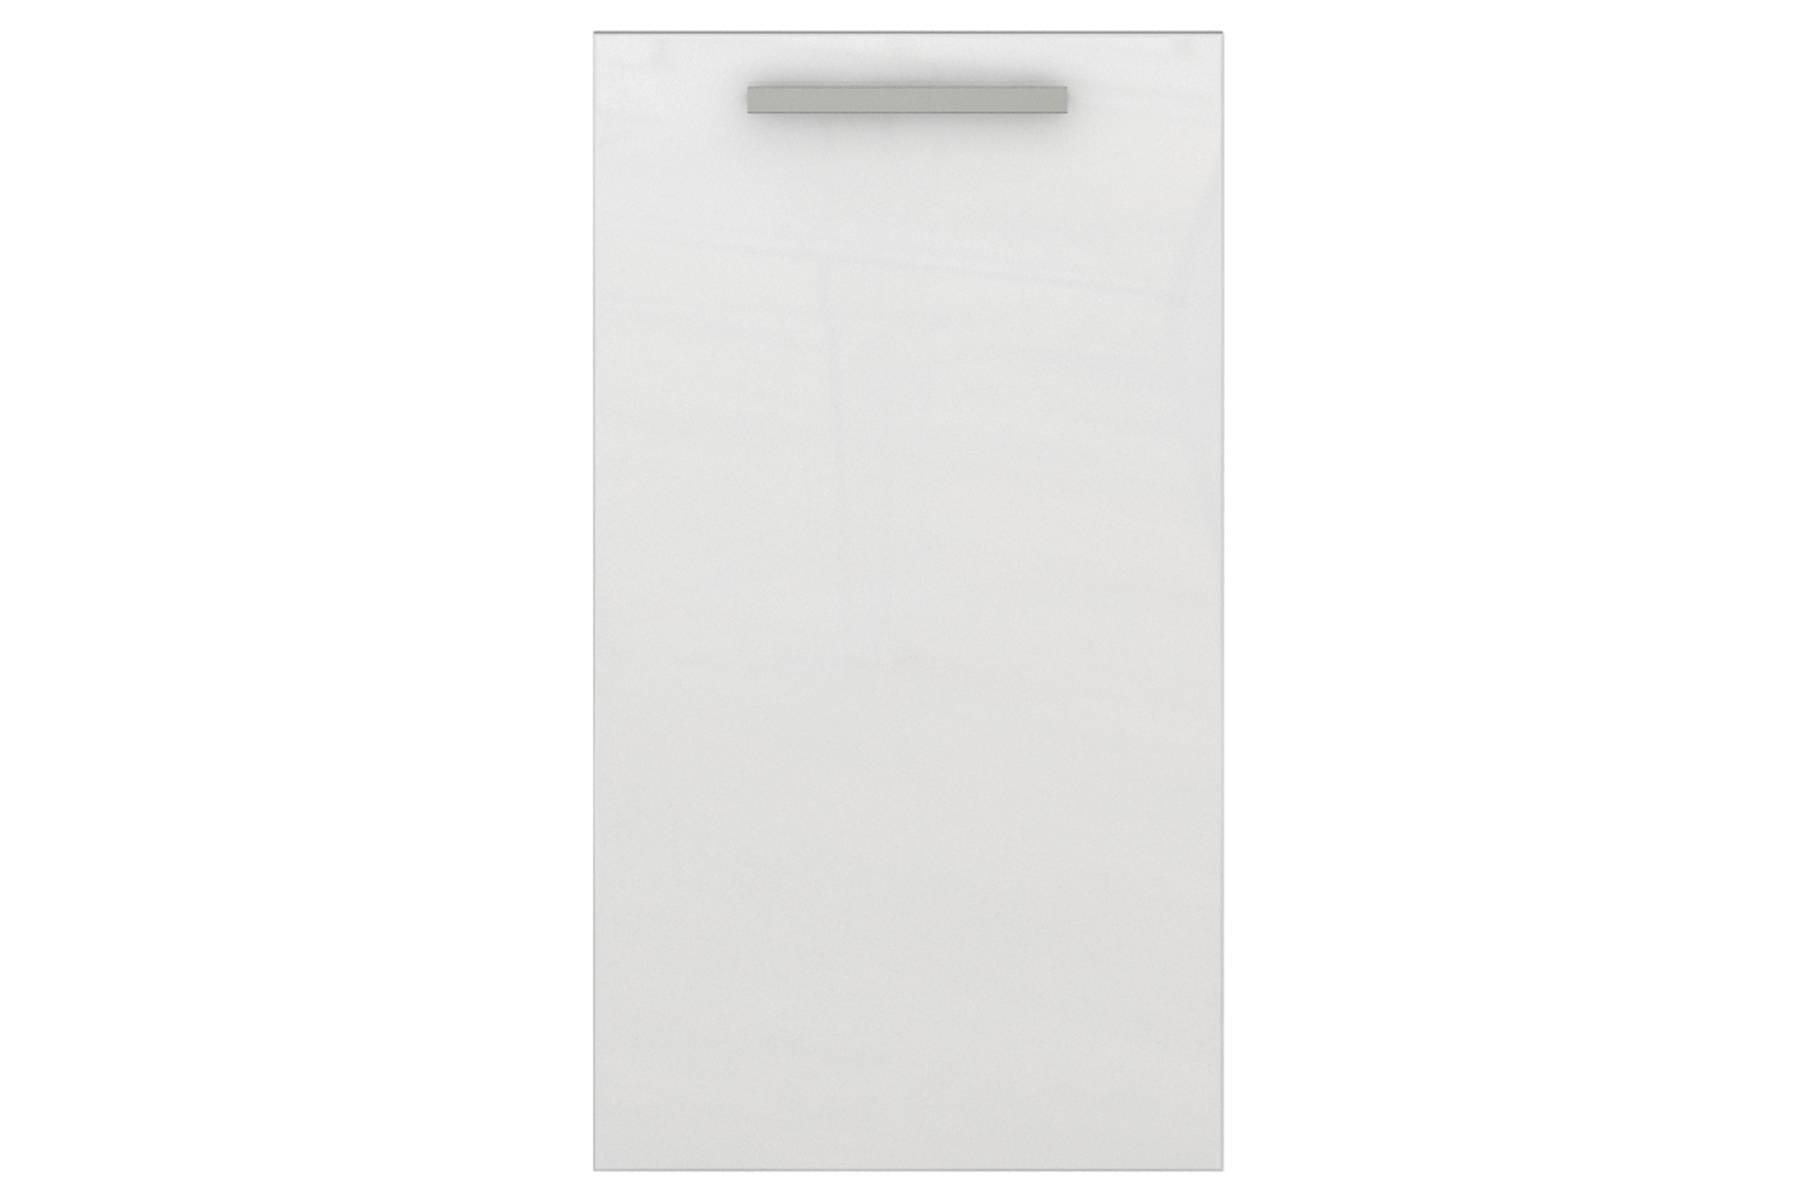 Фасад Хелена СТЛ.276.08 Белый глянец хелена роз свои правила